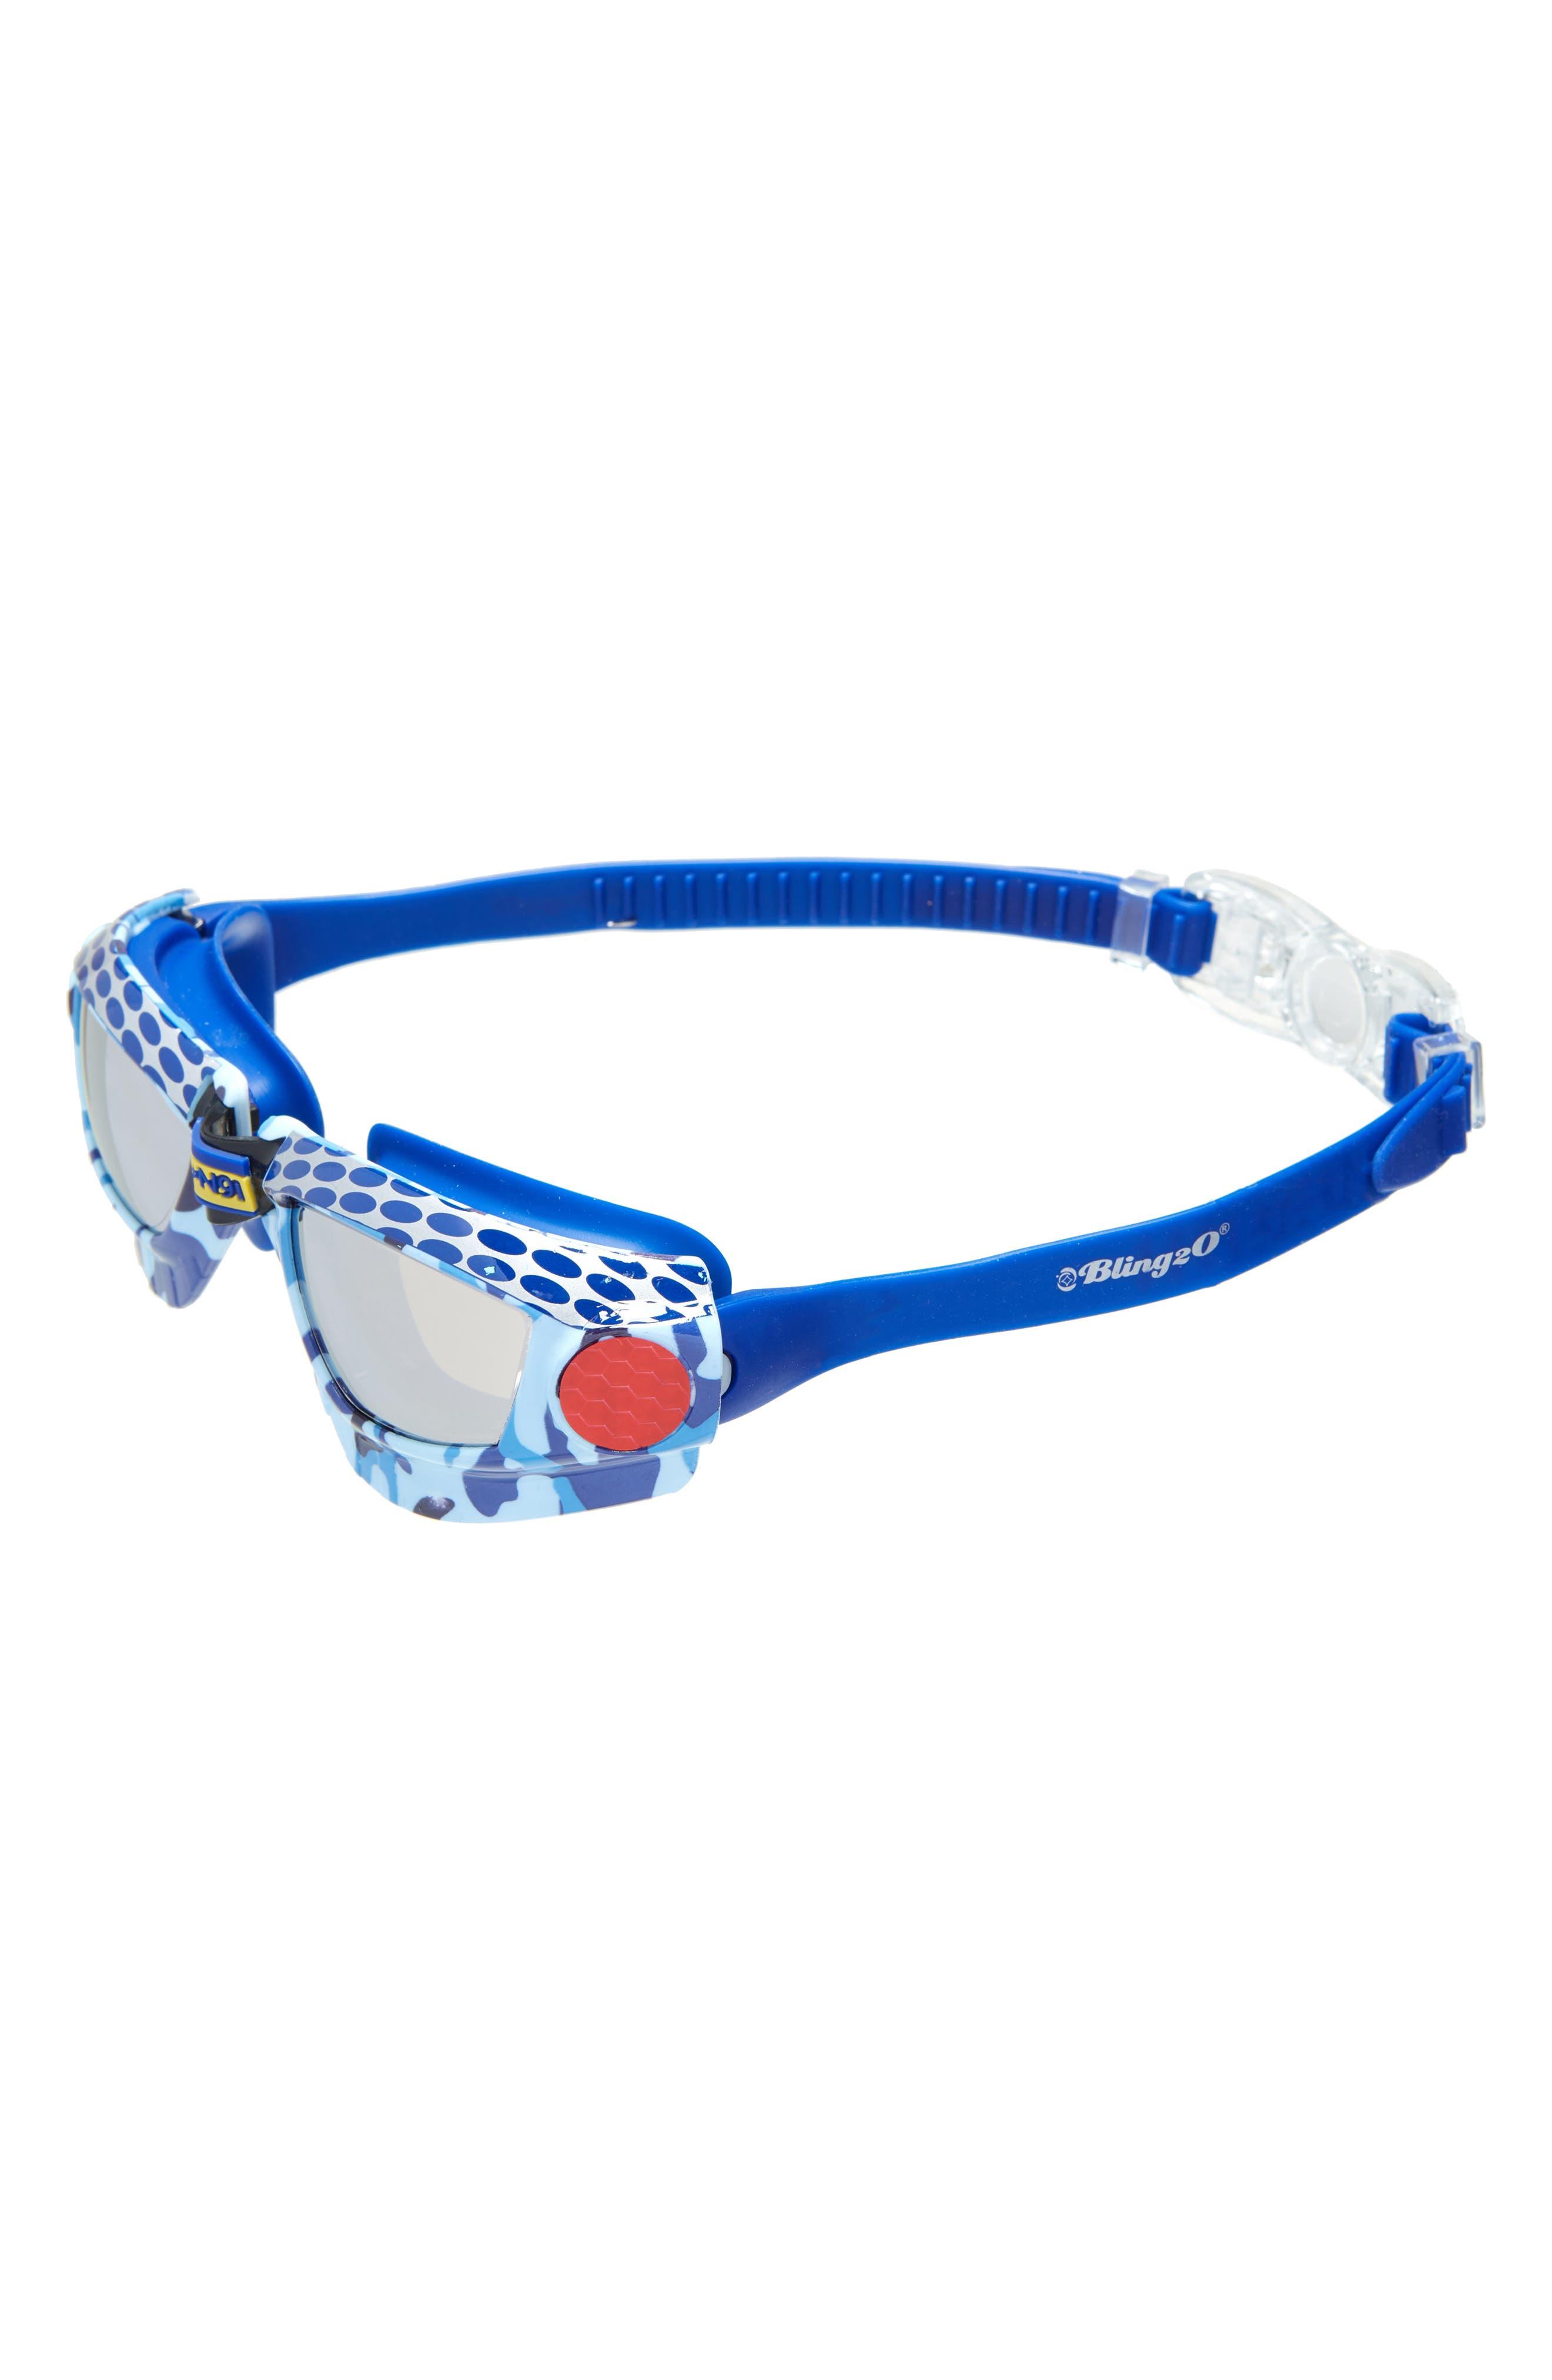 Bling2o Mud Racer Swim Goggles (Kids)